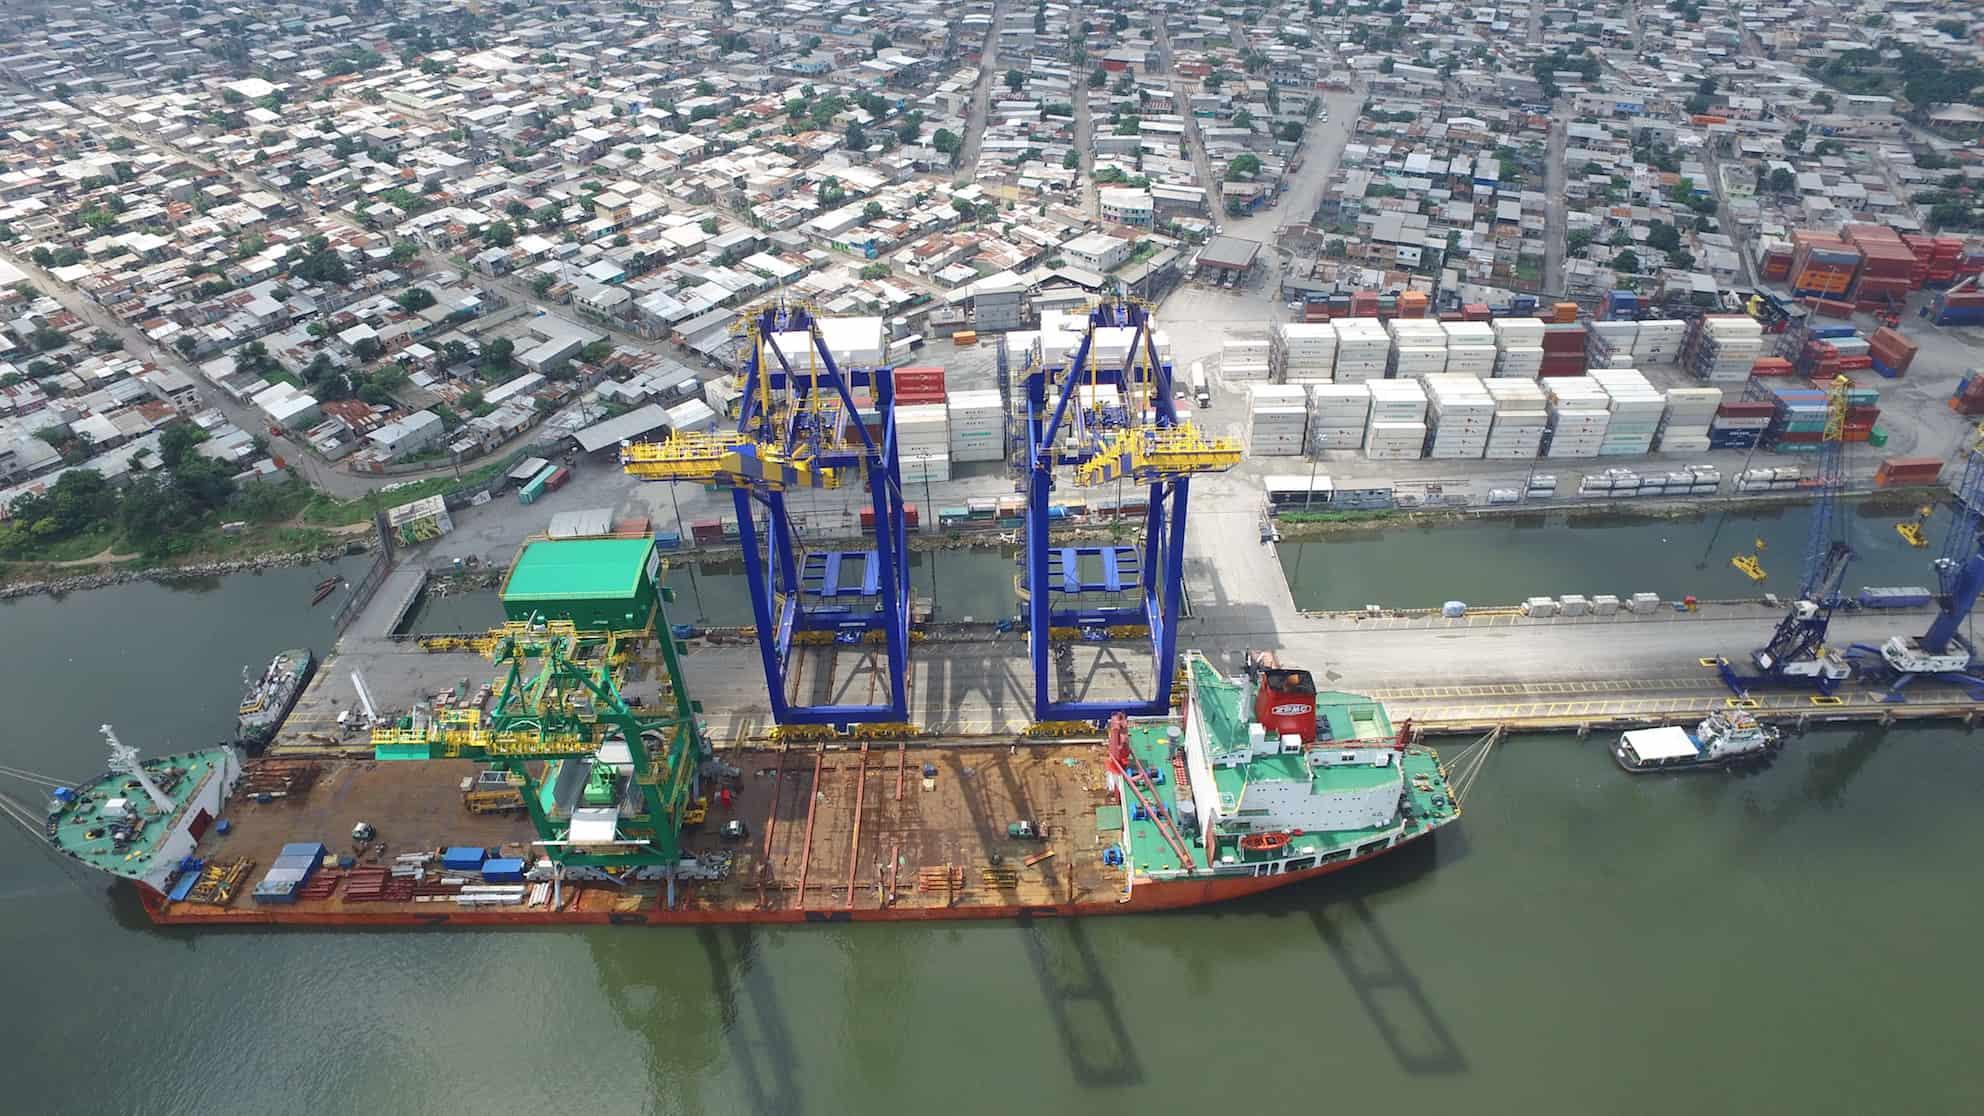 Terminal Portuario Guayaquil inaugurates operations